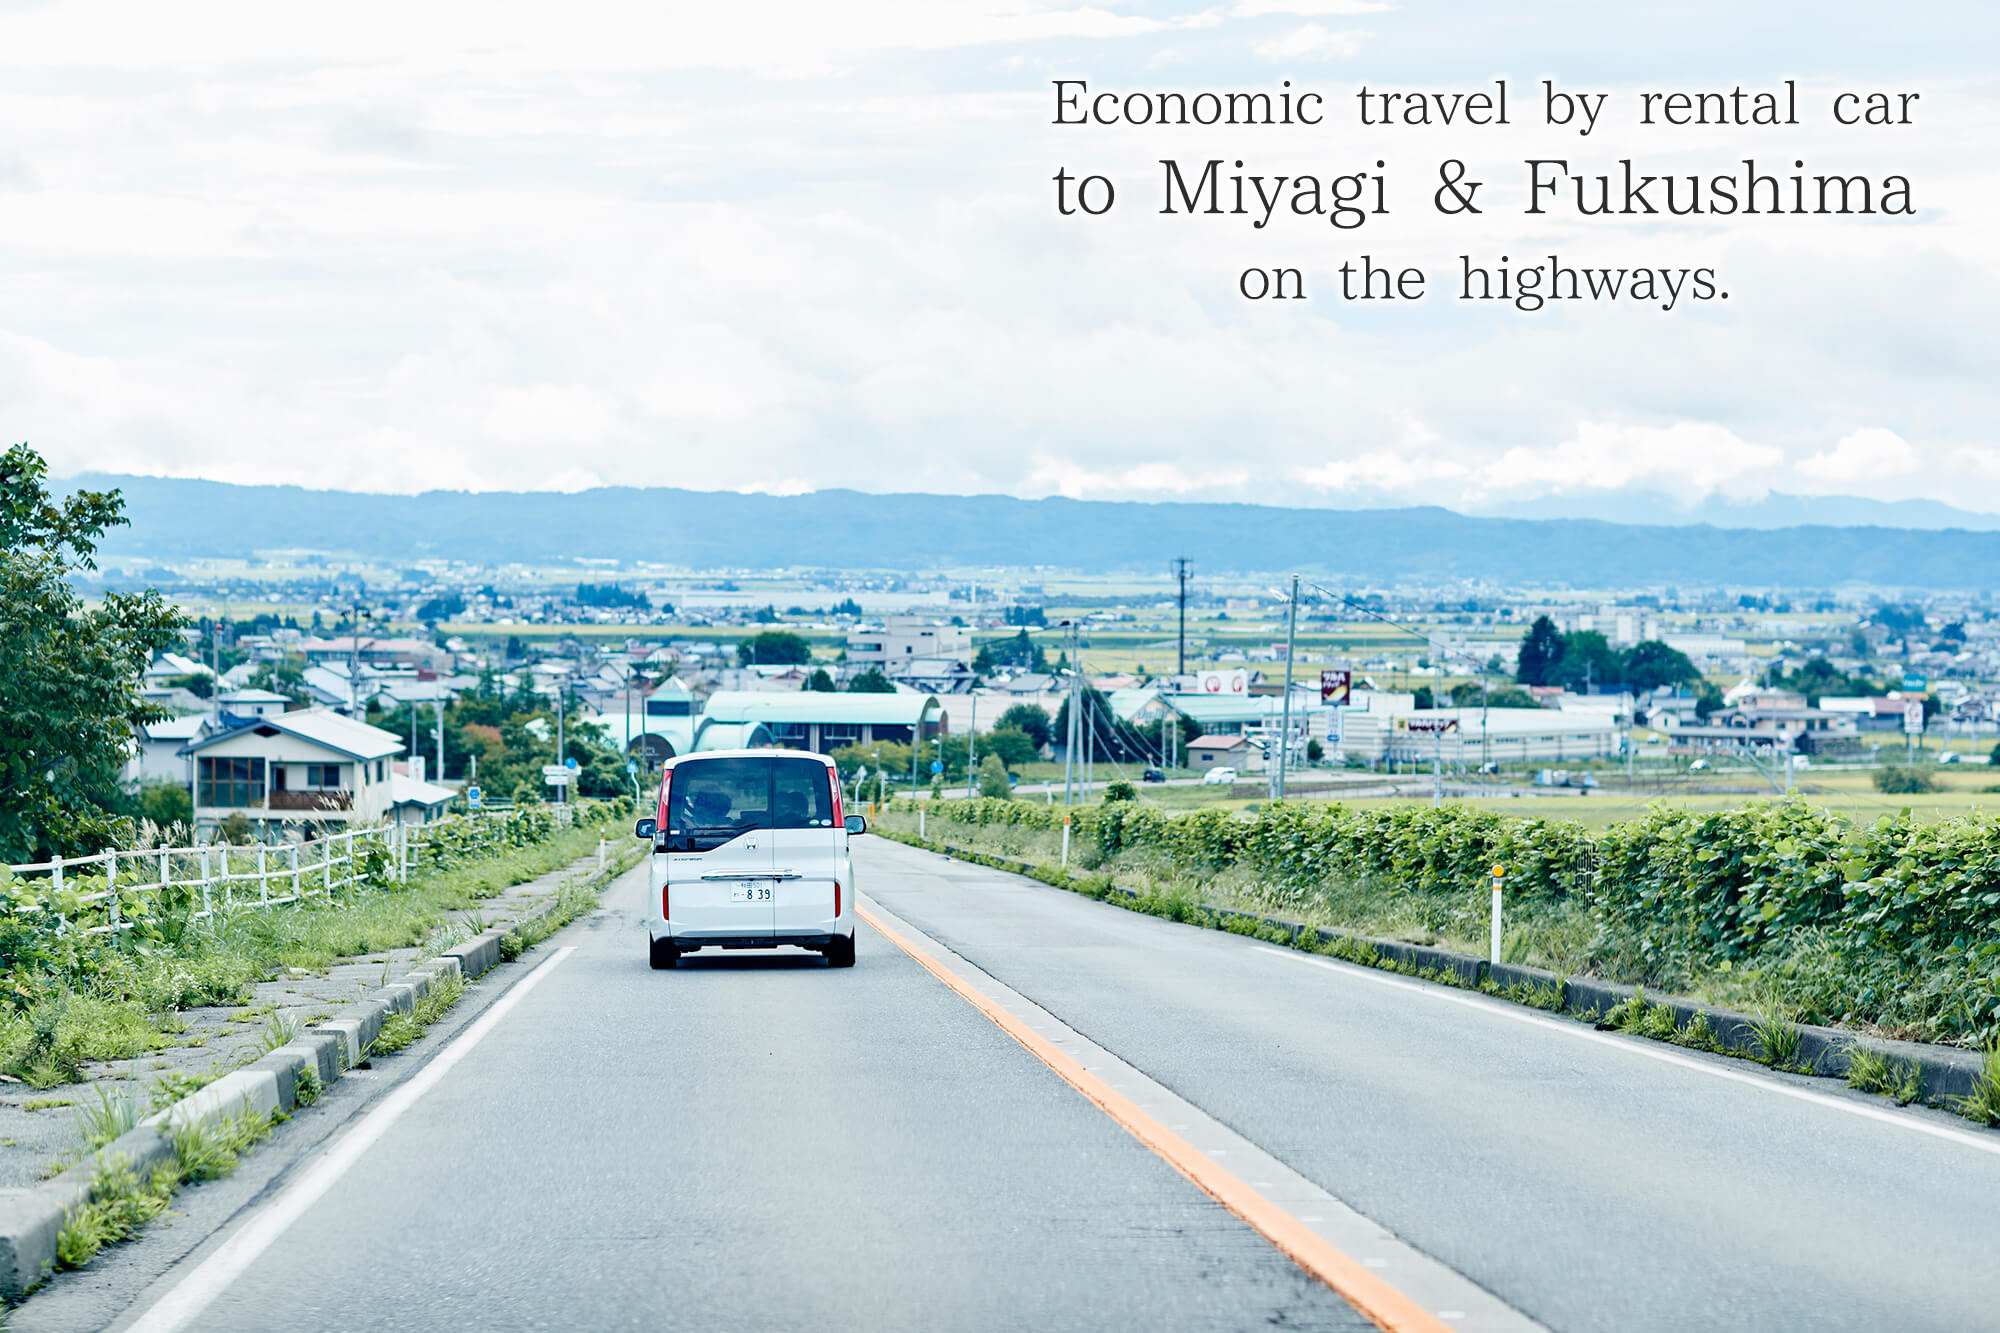 Economic travel by rental car to Miyagi & Fukushima on the highways